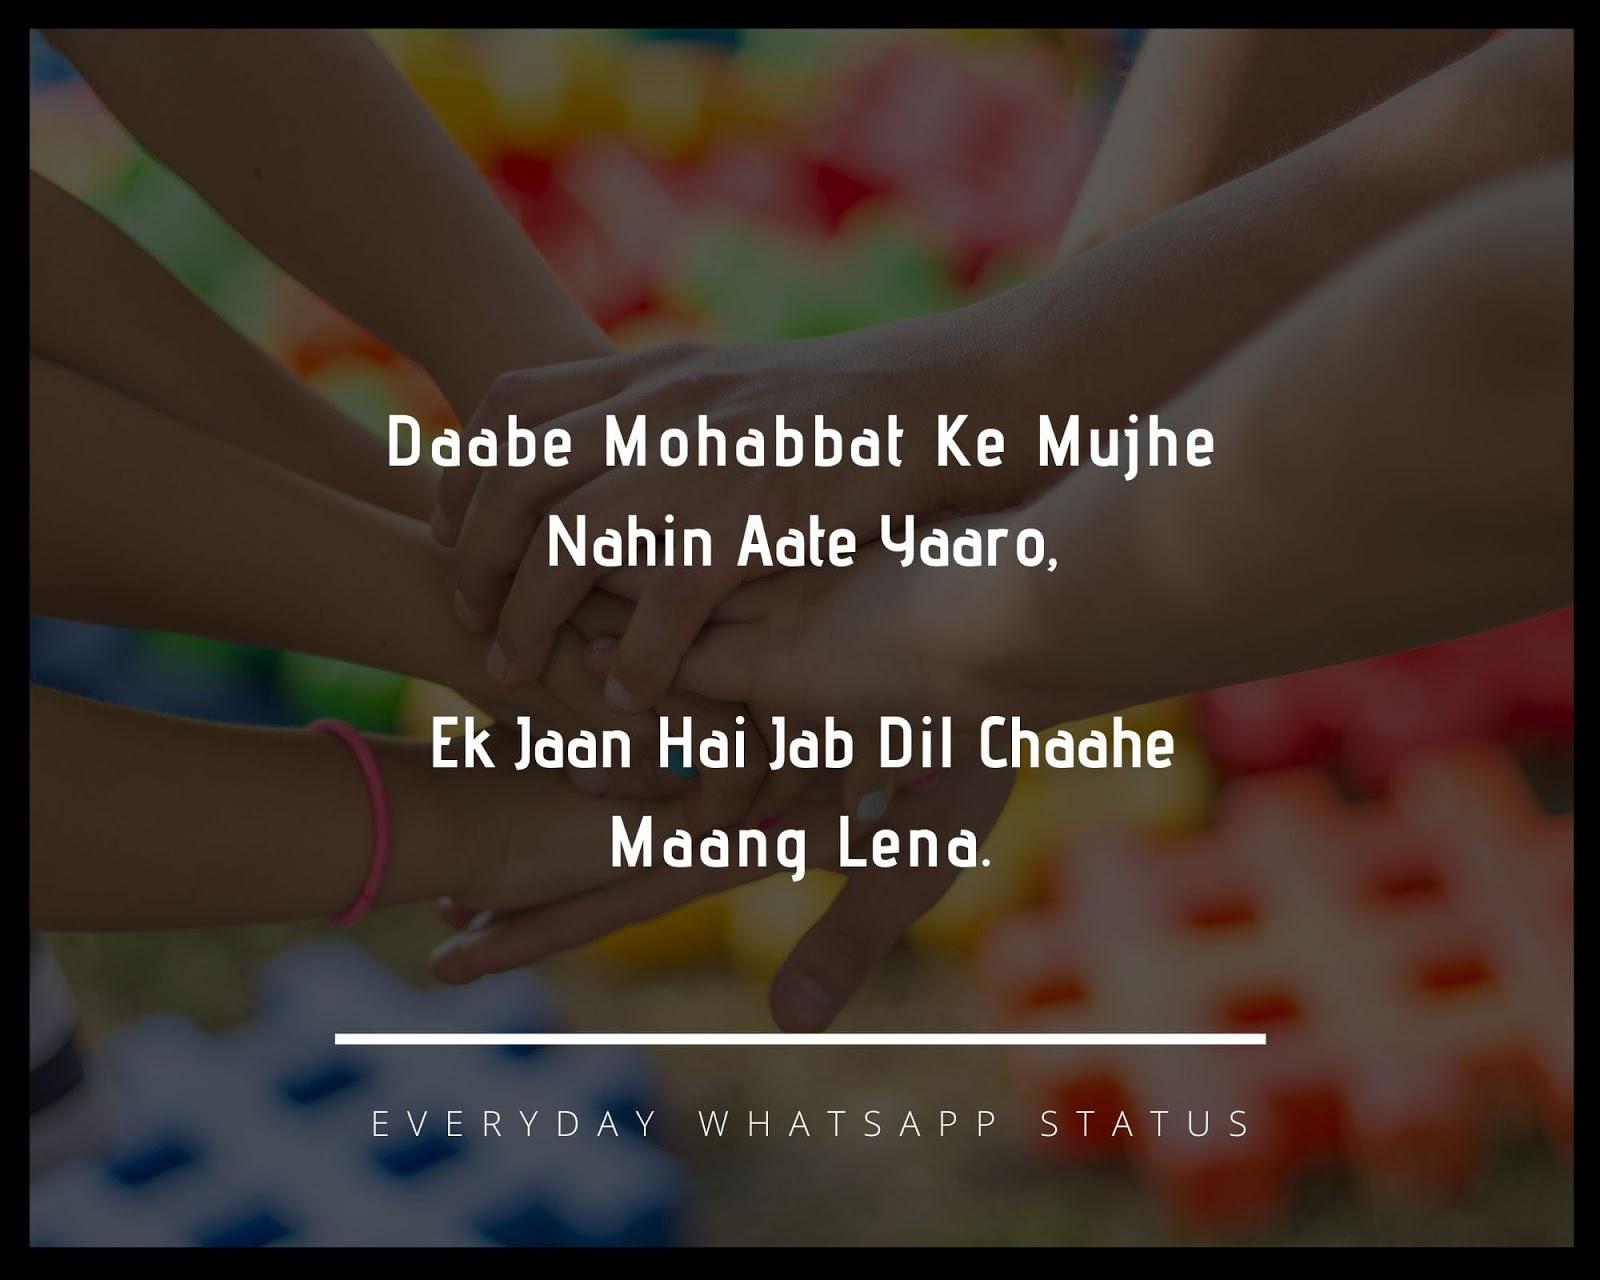 Beautiful Dosti Shayari - Daabe Mohabbat Ke Mujhe